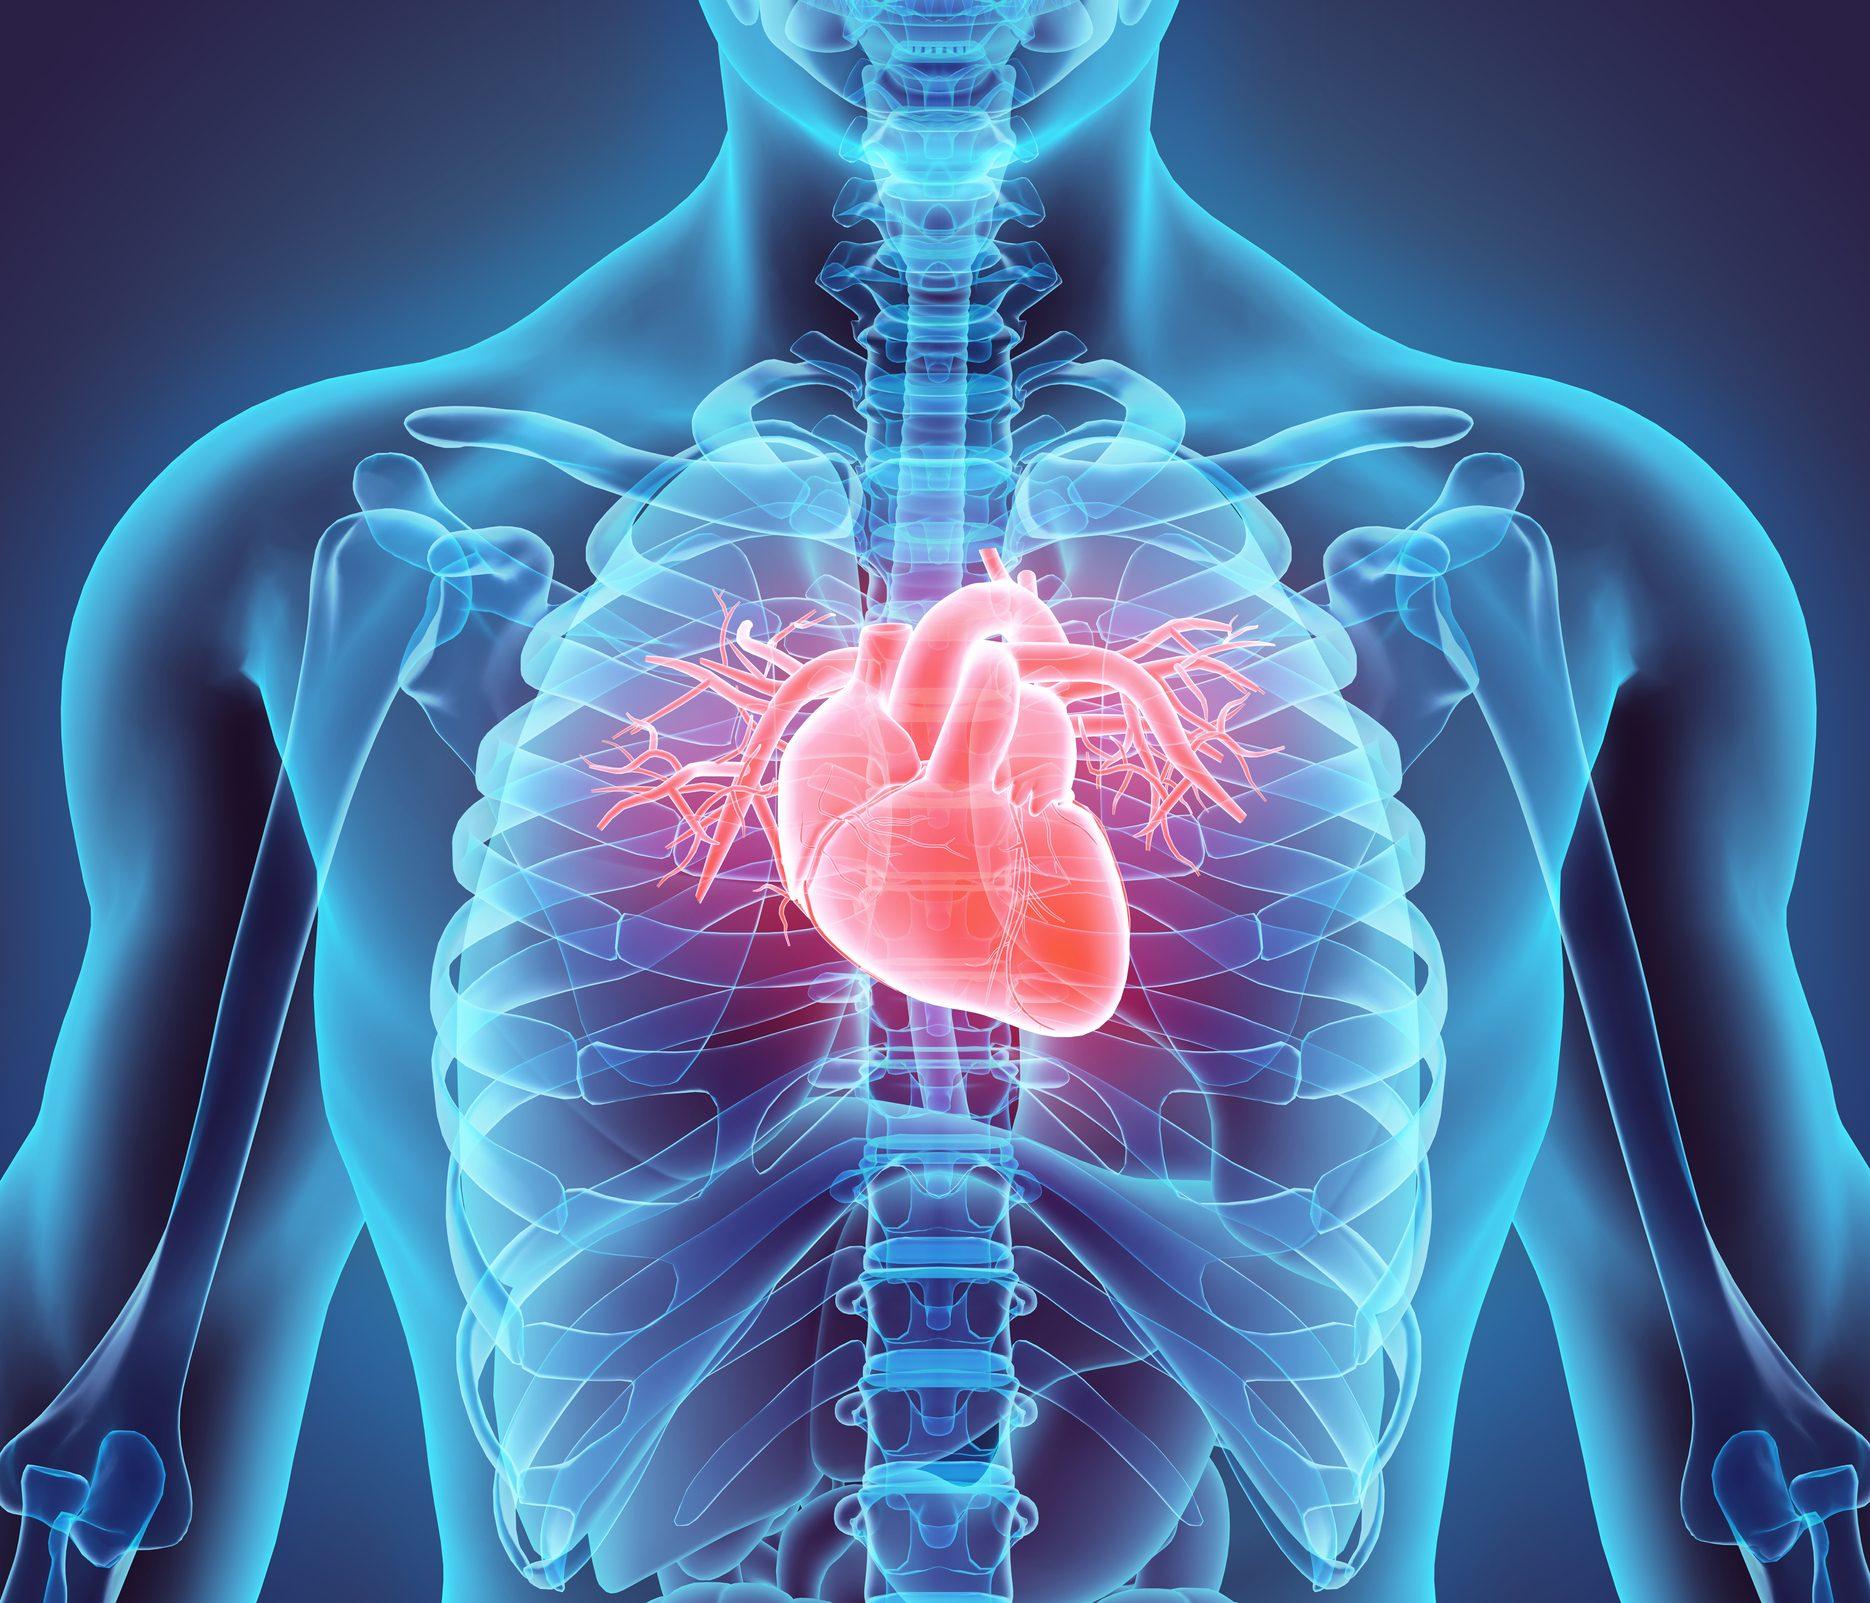 3D illustration of Heart in chest